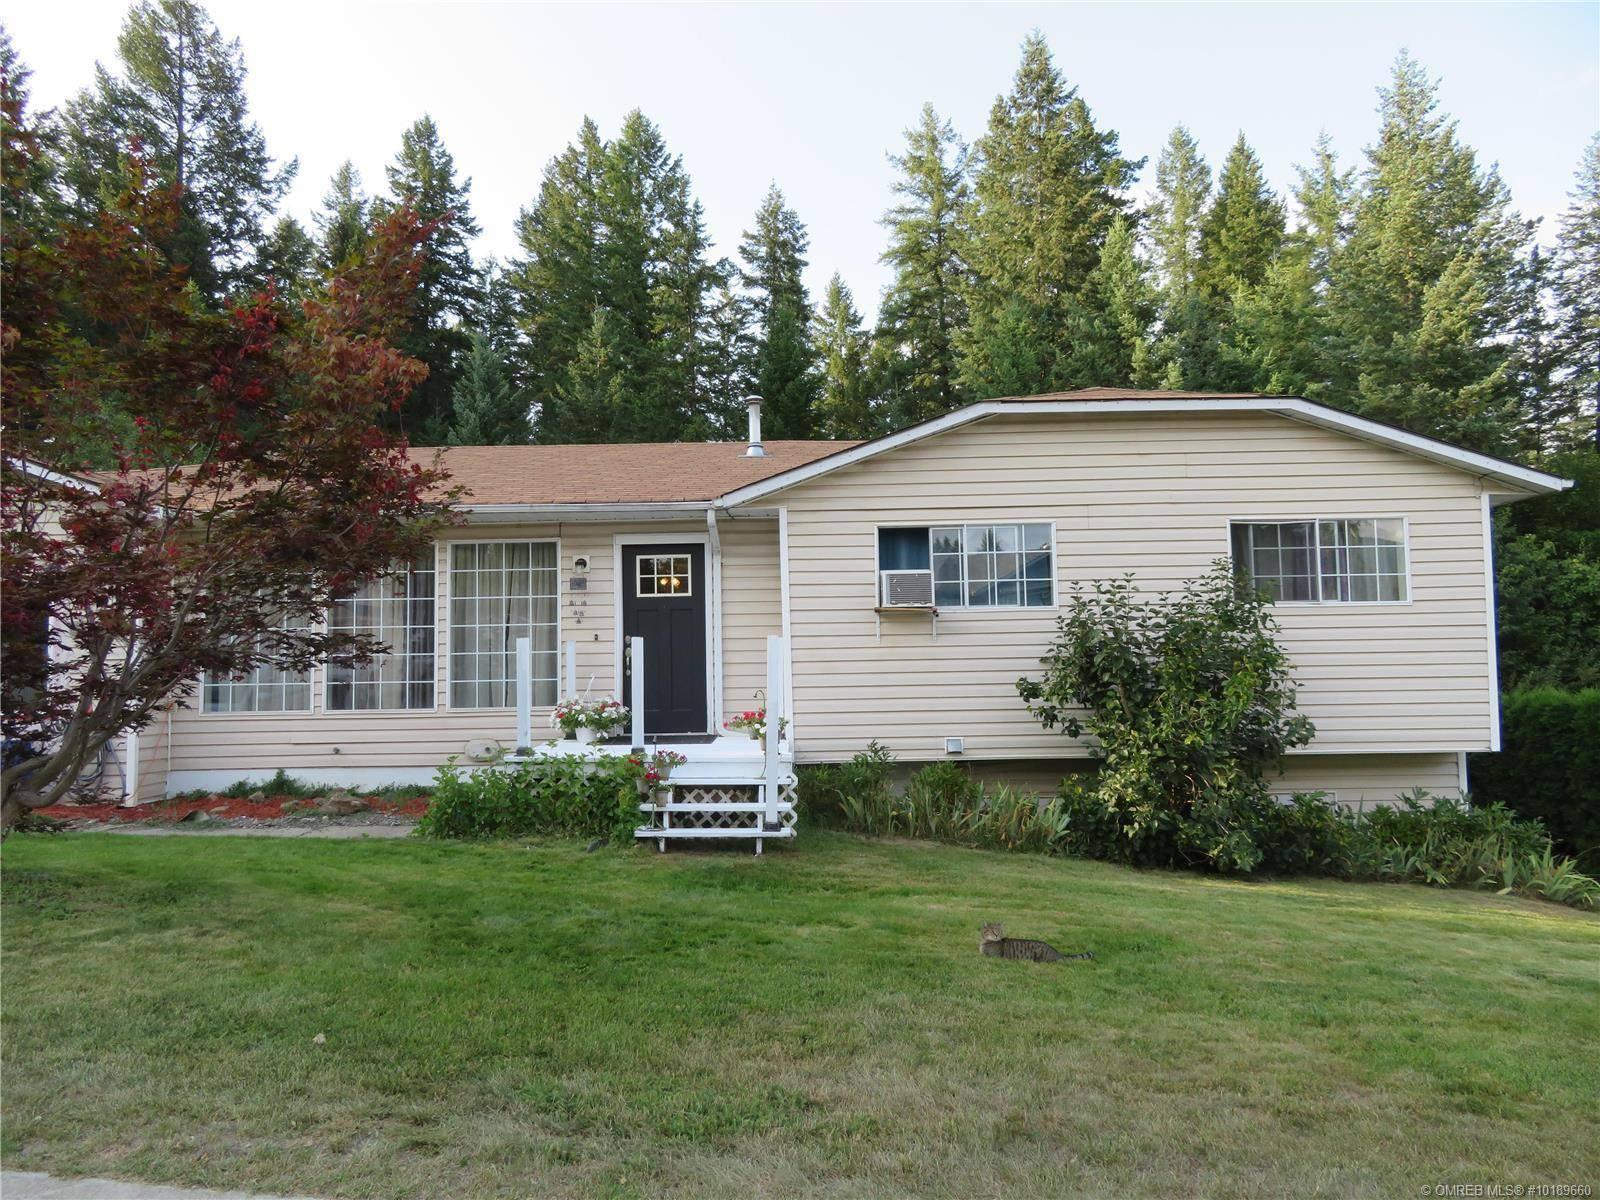 House for sale at 2275 Leblanc St Lumby, Bc British Columbia - MLS: 10189660